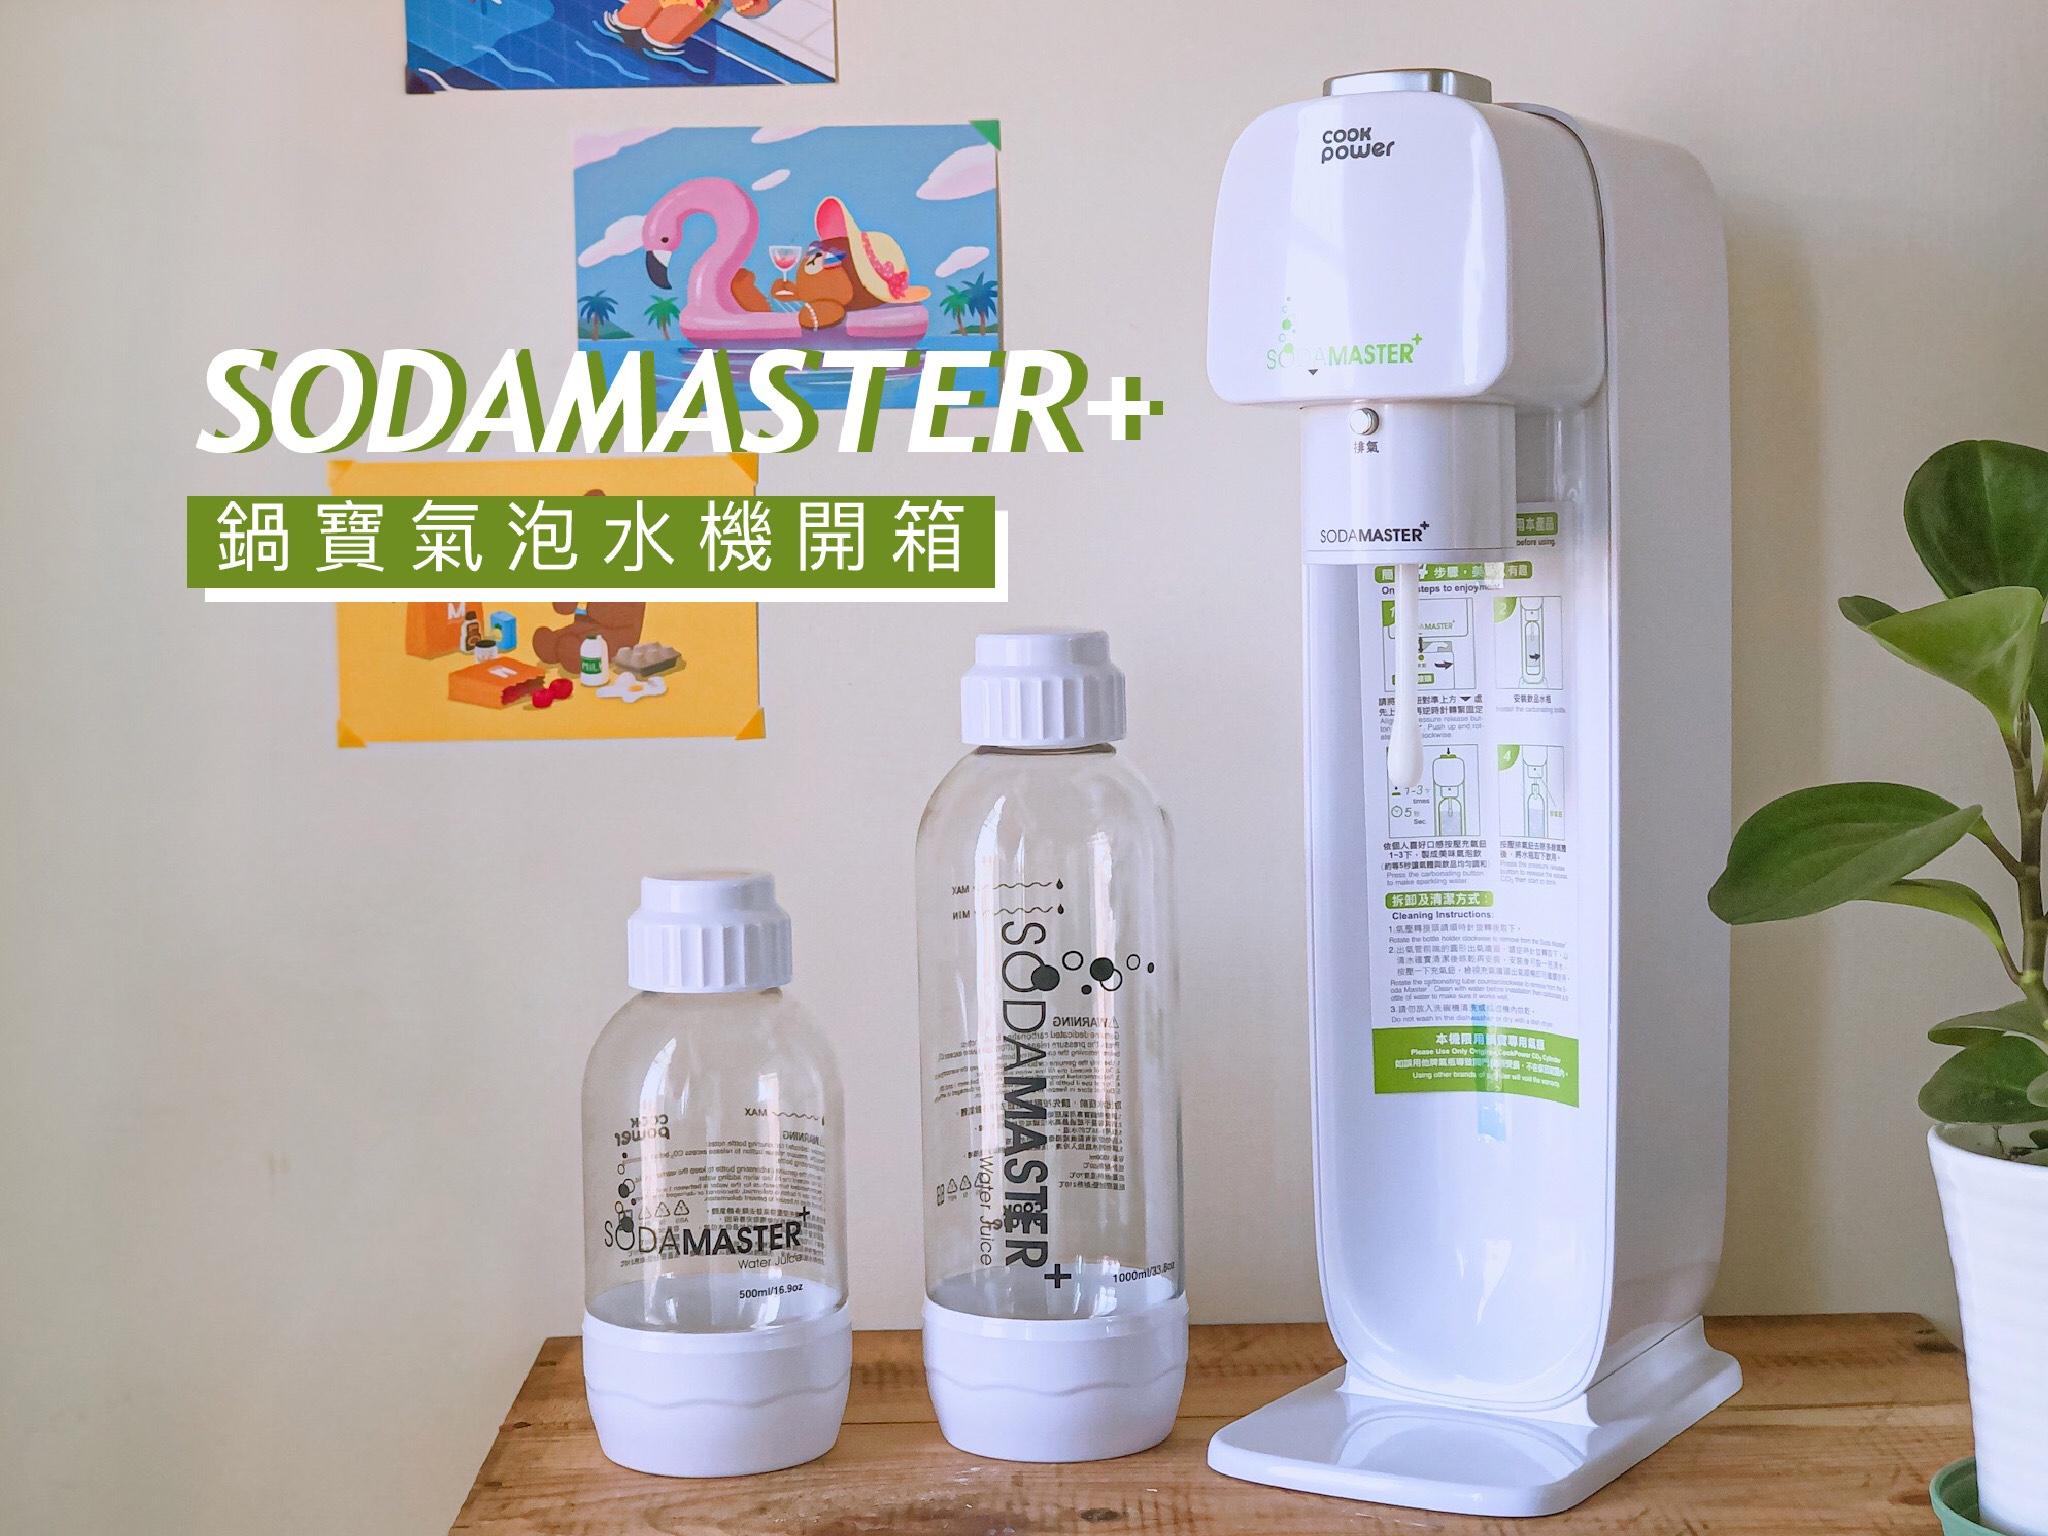 SODAMASTER+鍋寶萬用氣泡水機開箱!女兒給爸爸的夏日禮物|sansan開箱